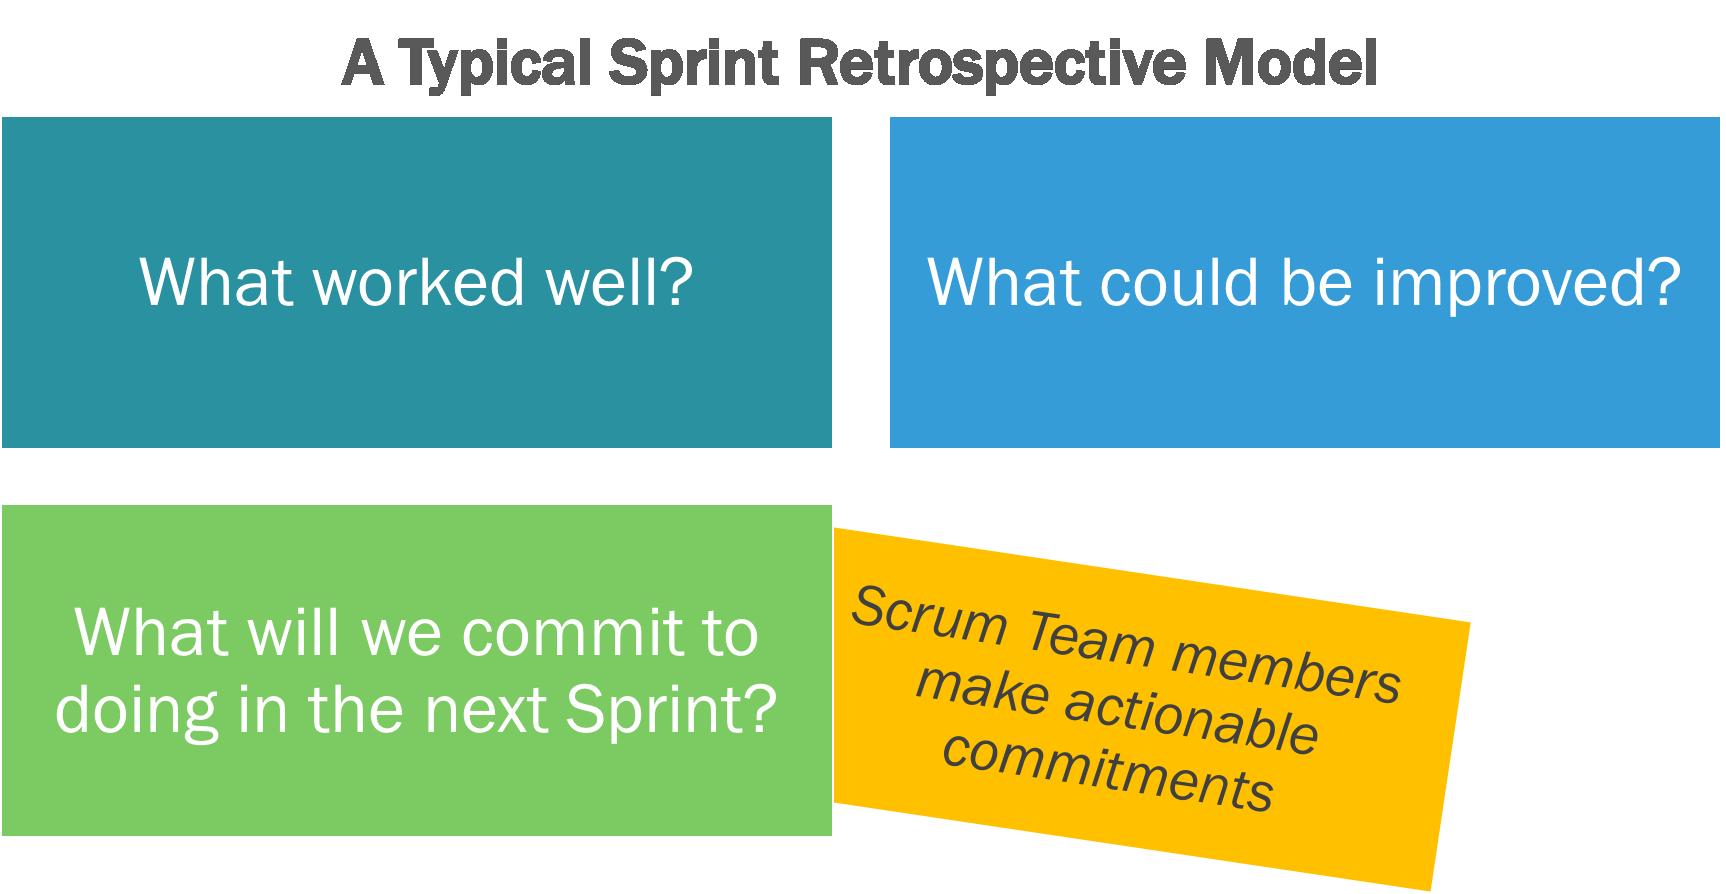 Sprint retrospective model